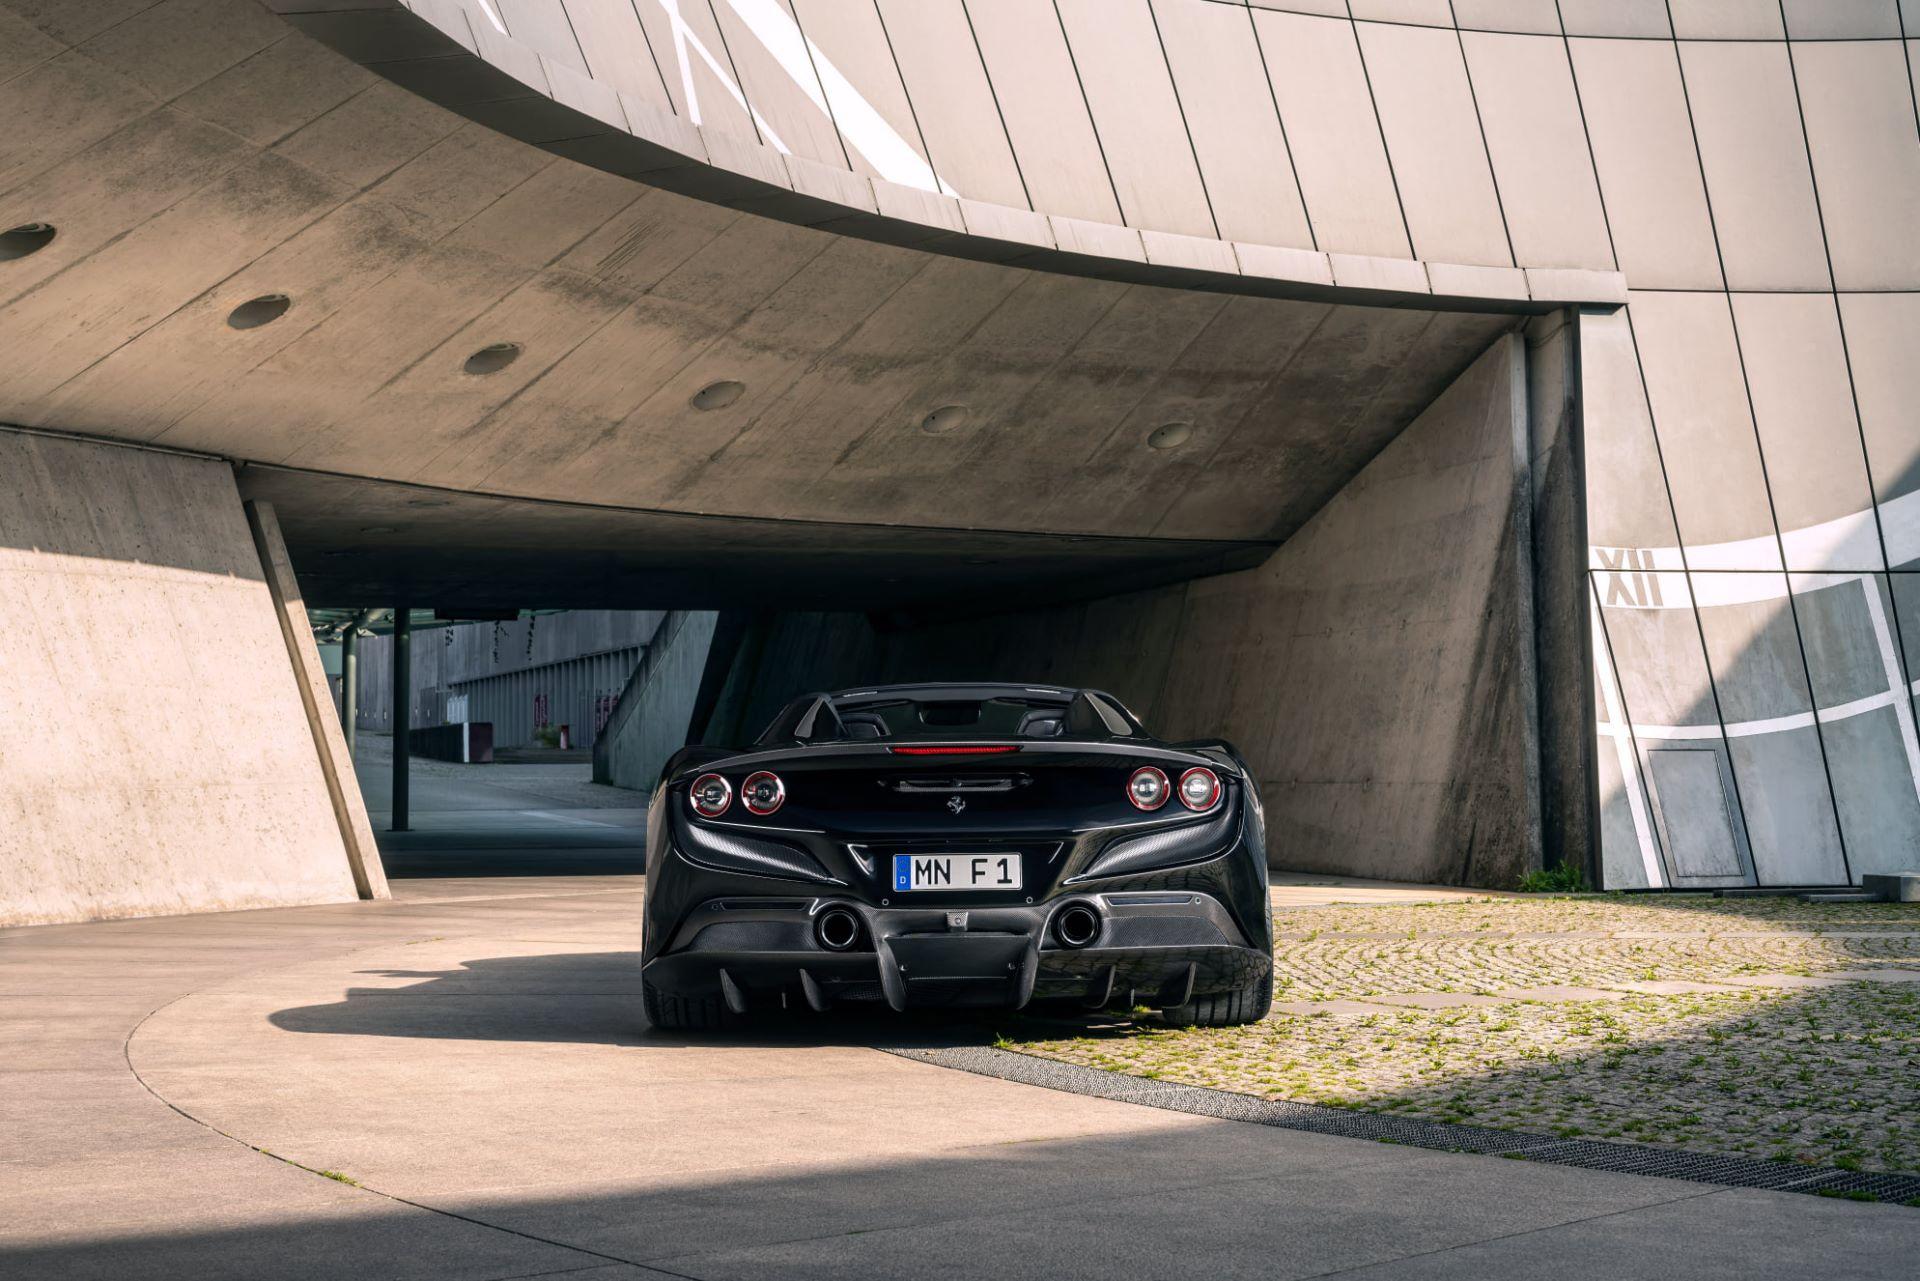 Ferrari-F8-Spider-by-Novitec-4